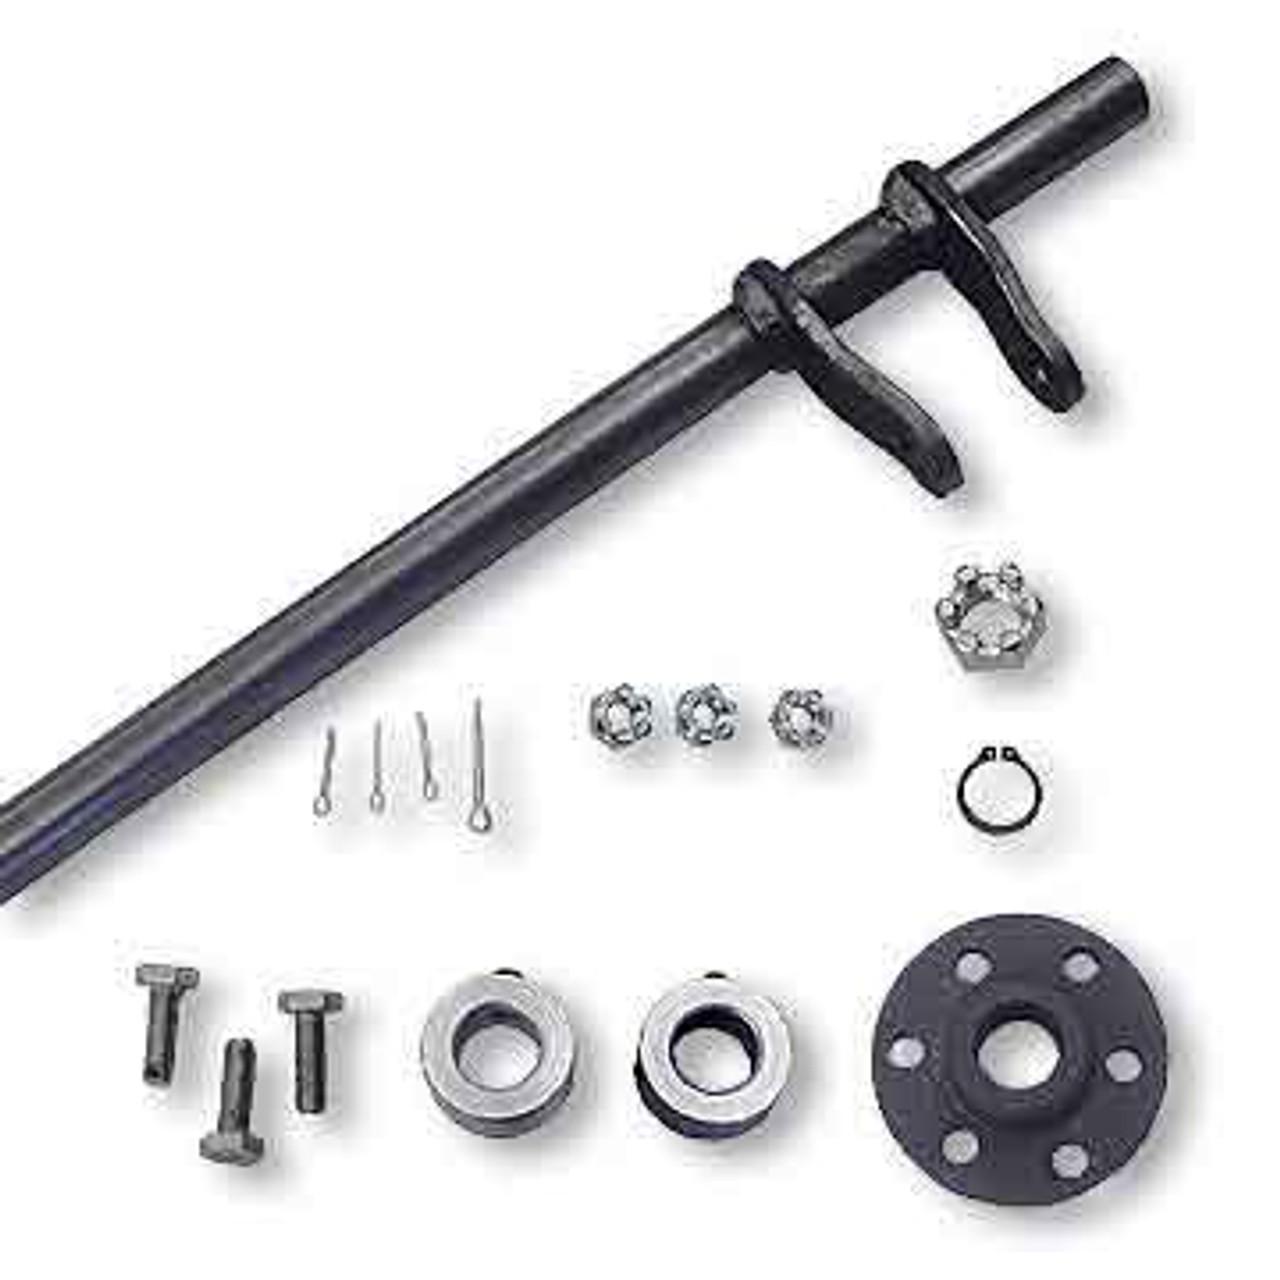 "Steering Shaft, 5/8"" OD & Hub Kit, Welded Pitman Arms, 22"" Length"